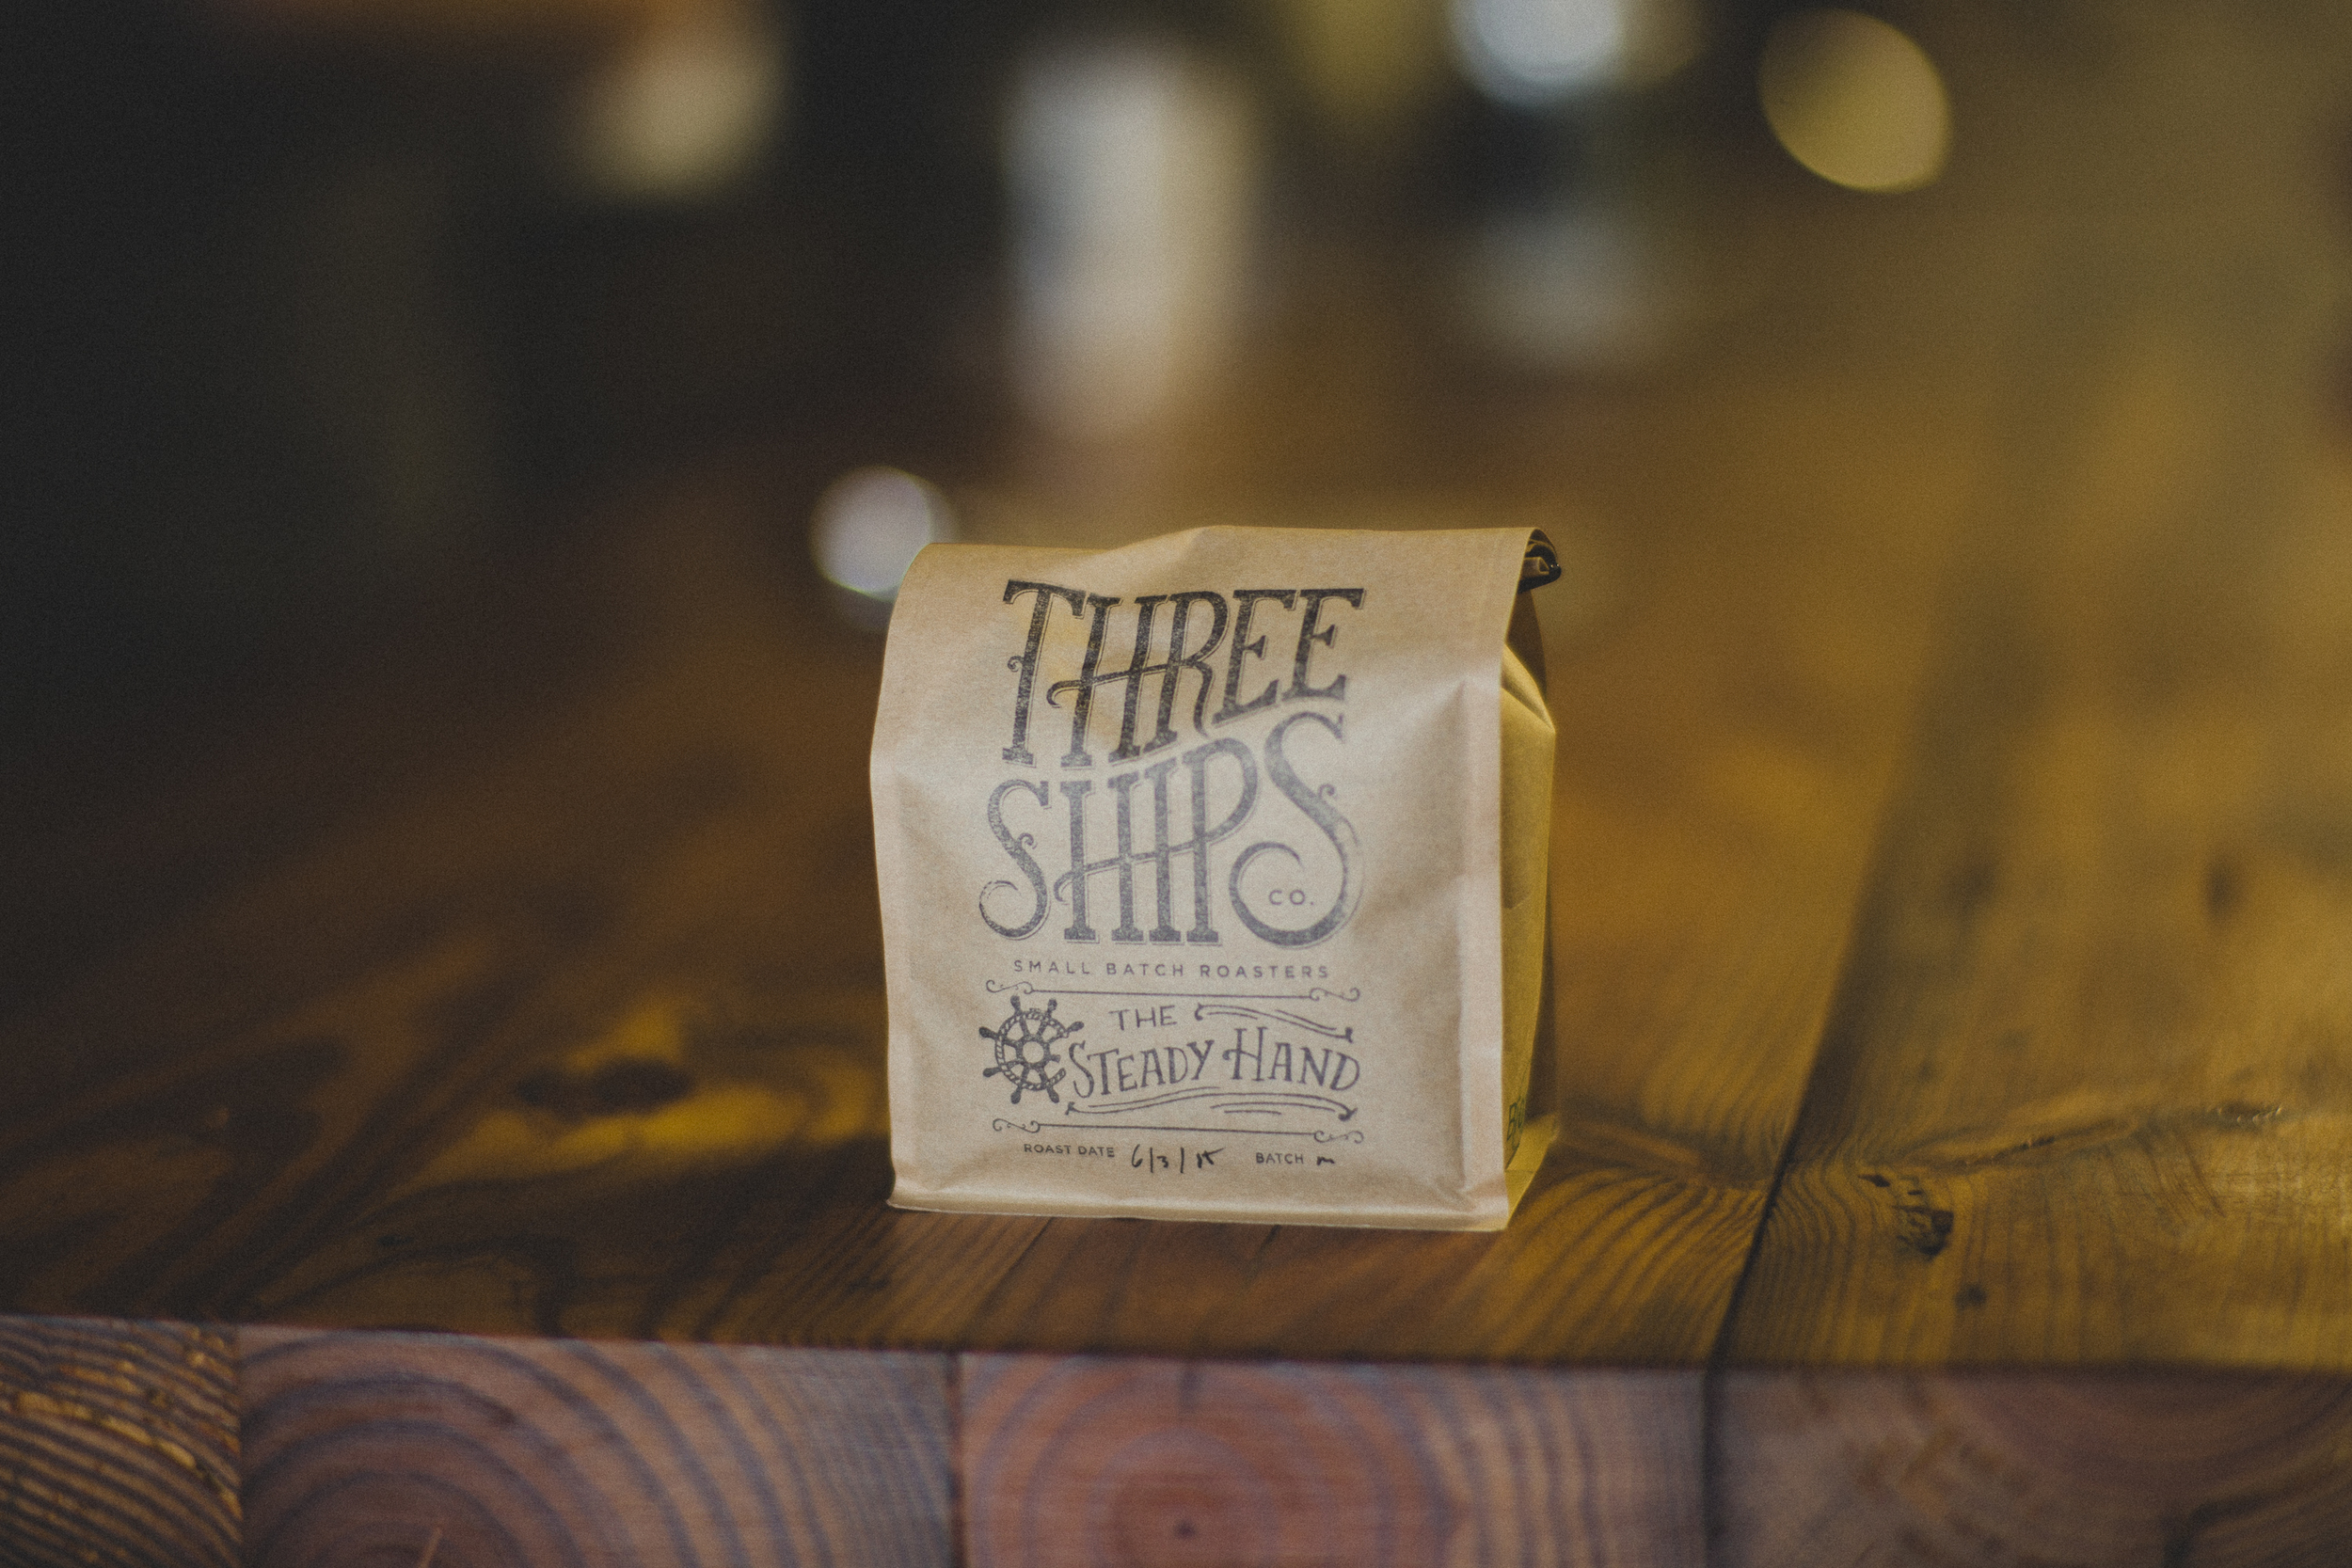 three-ships-coffee-27.jpg